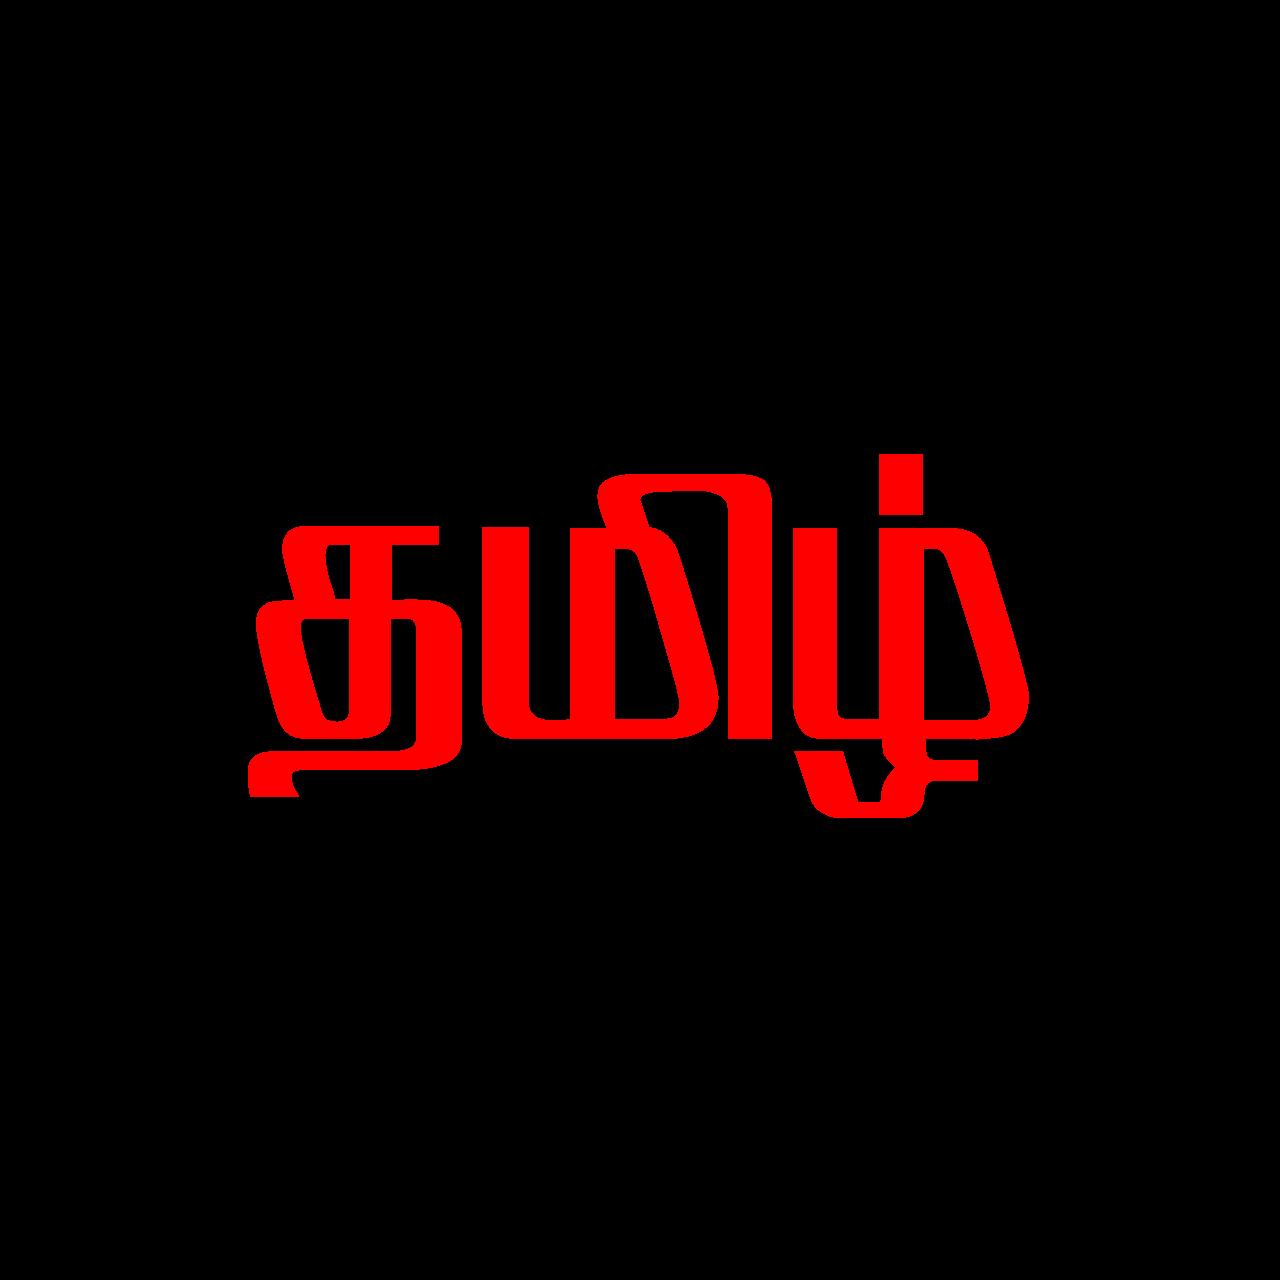 Nhm coverter softwre details tamil and engilsh; Ka Tamil Fonts Free Download Peatix